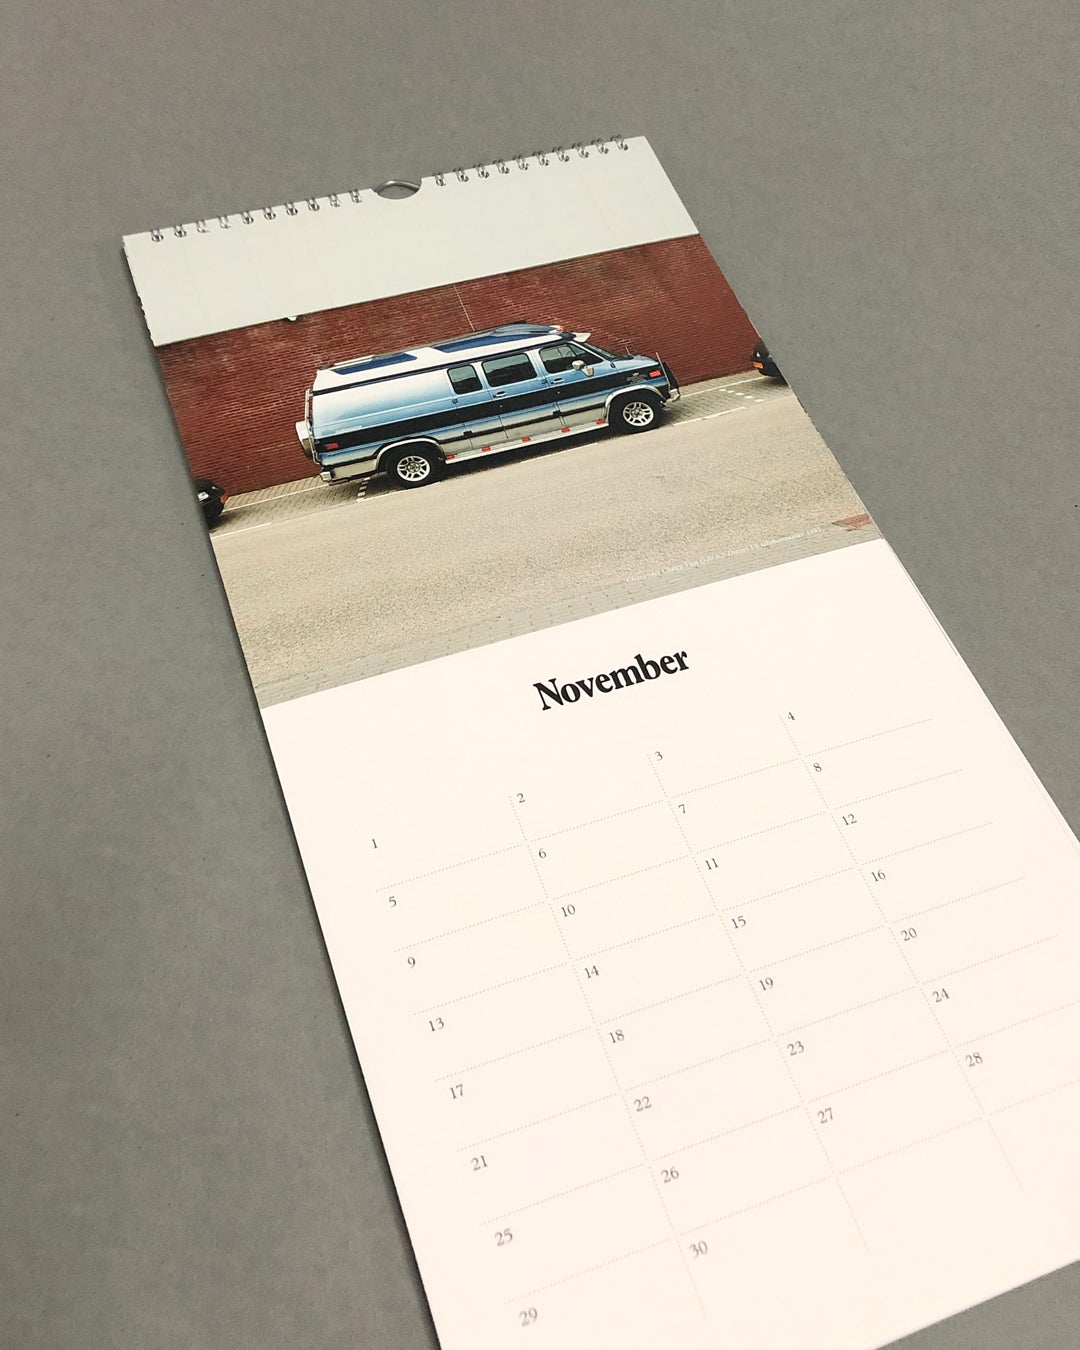 Image of The Dream Car Birthday Calendar